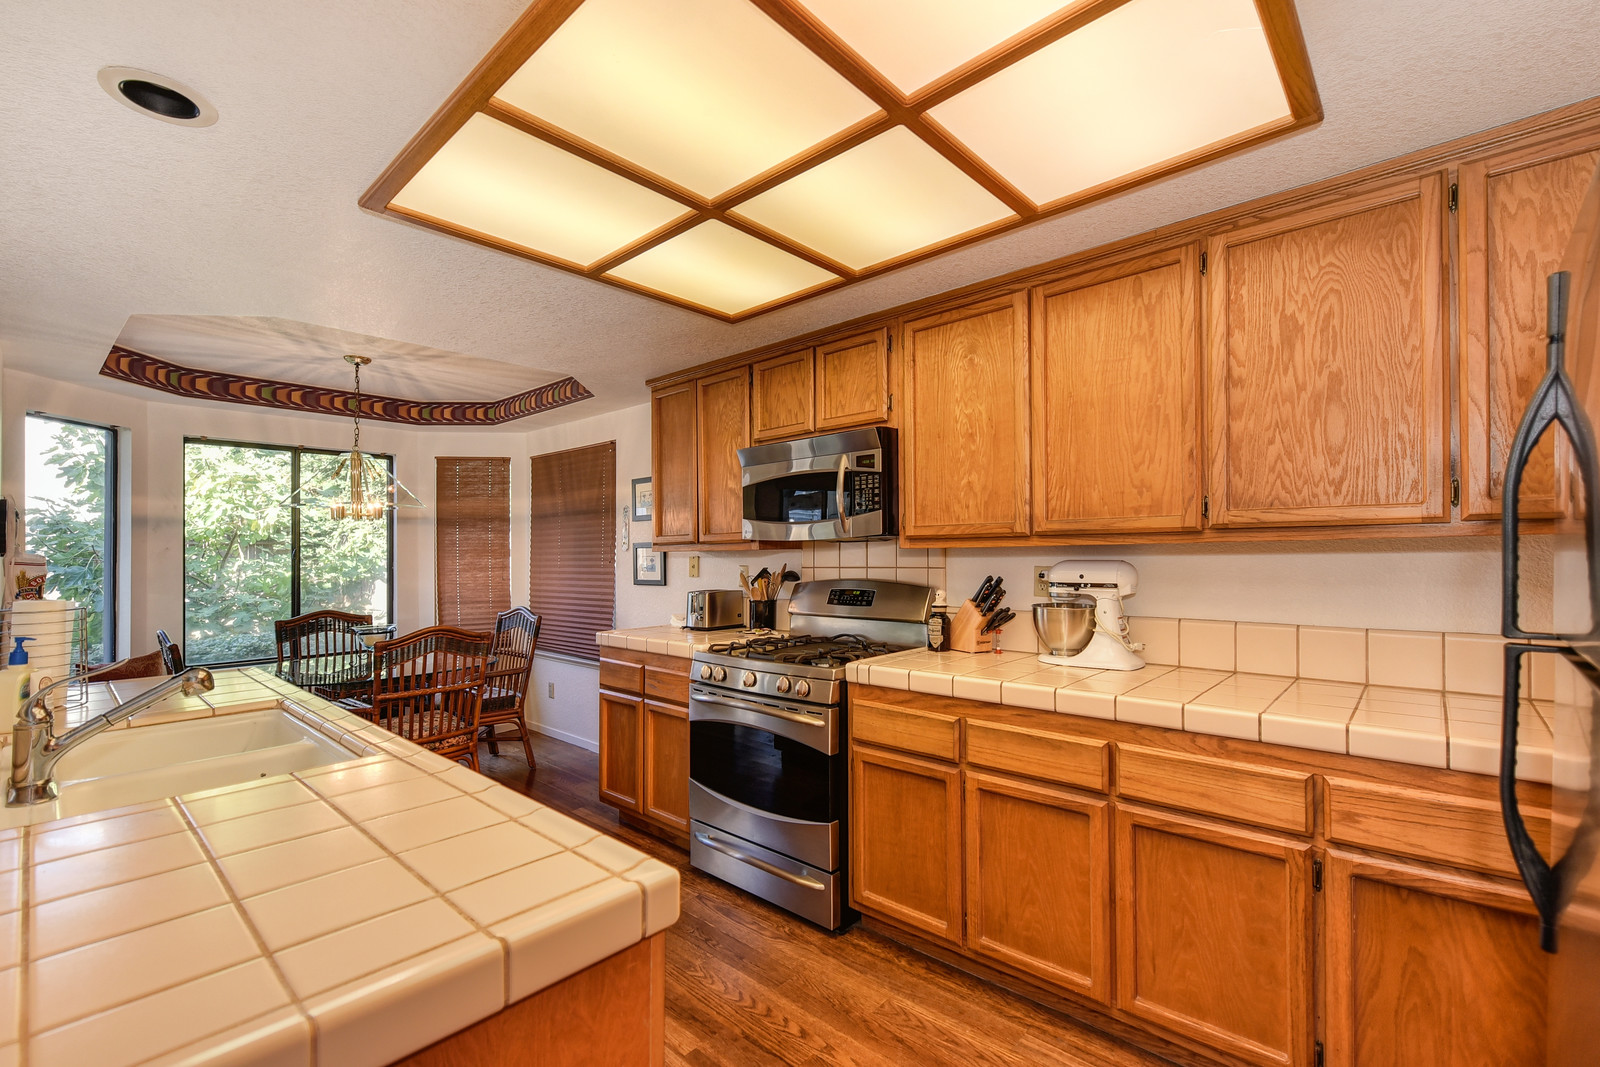 9158 Old Creek Rd Elk Grove Kitchen | Realtor in Elk Grove California | Elk Grove California homes for sale